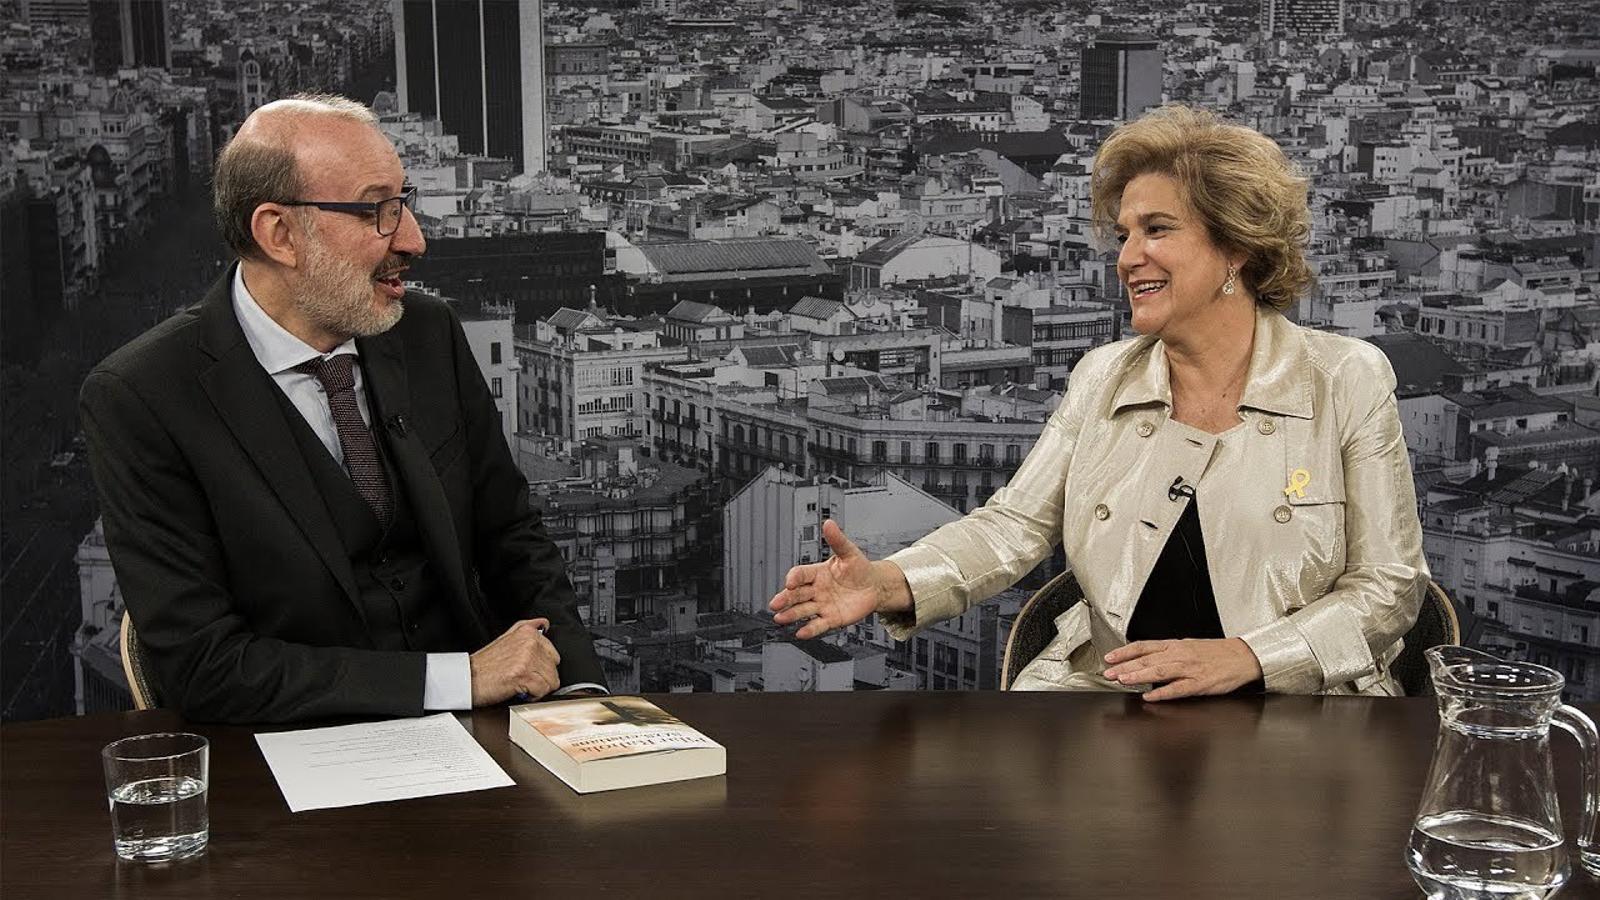 Entrevista d'Antoni Bassas a Pilar Rahola